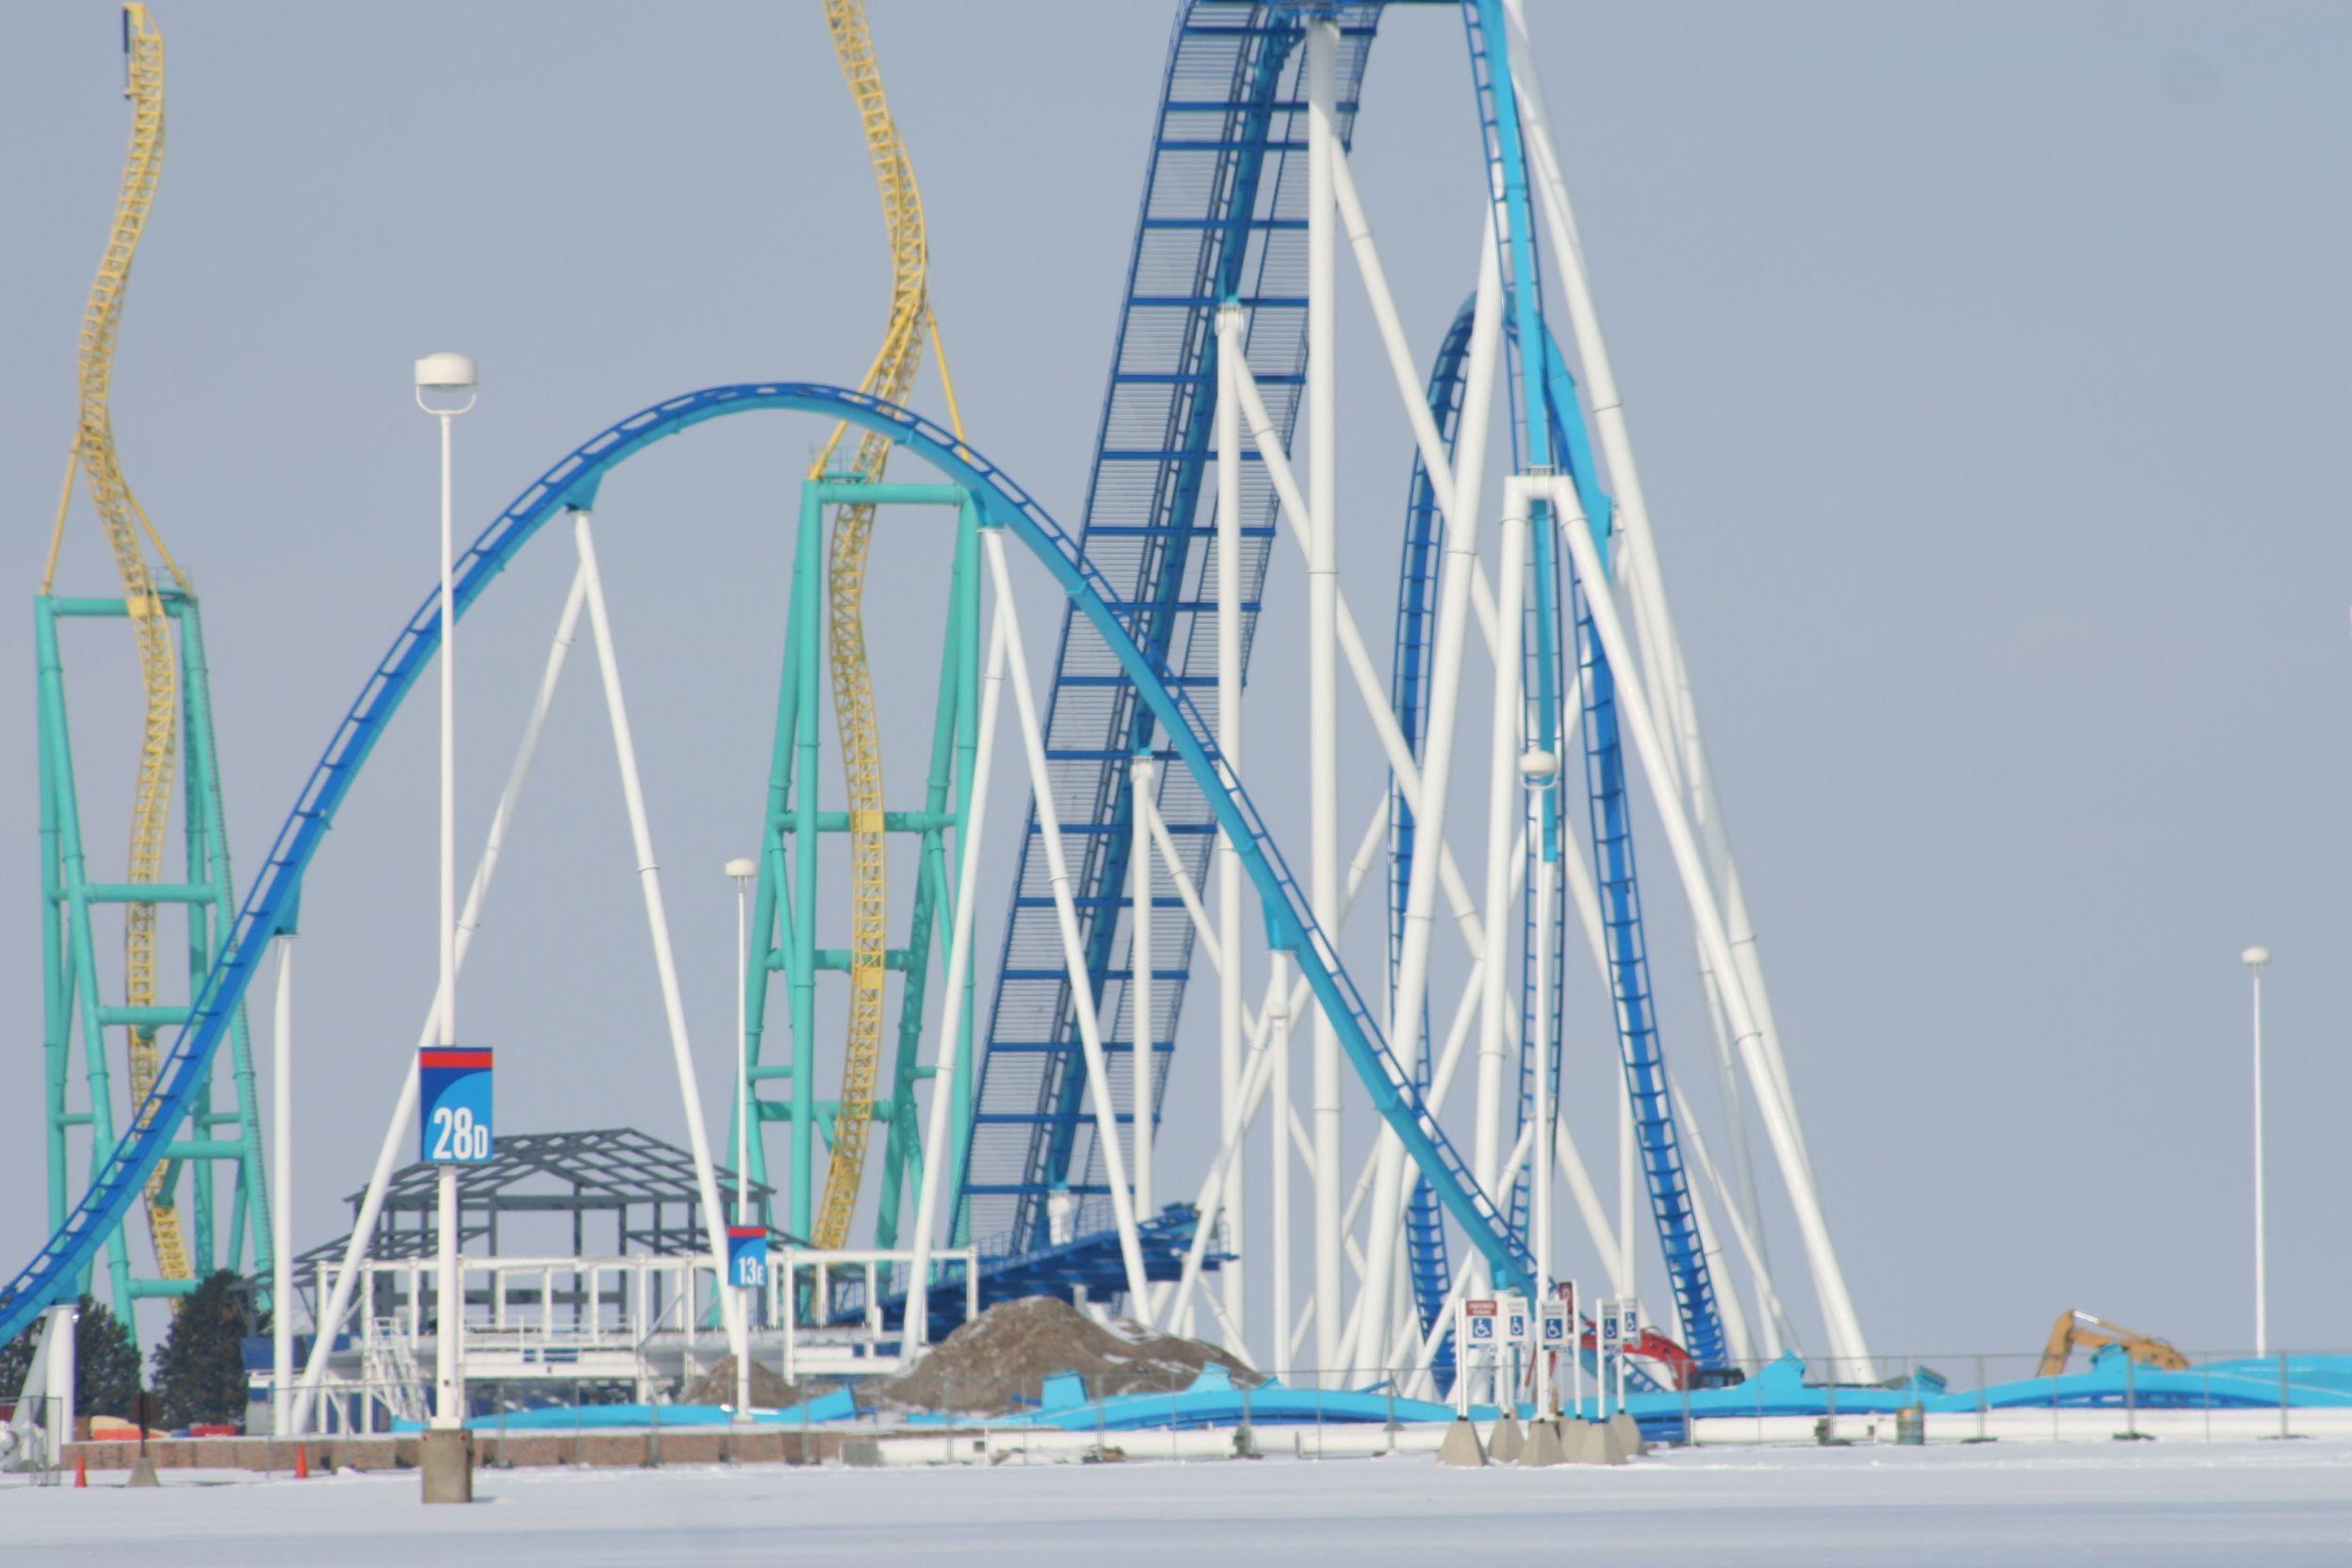 #GateKeeper construction at Cedar Point - Sandusky, Ohio.